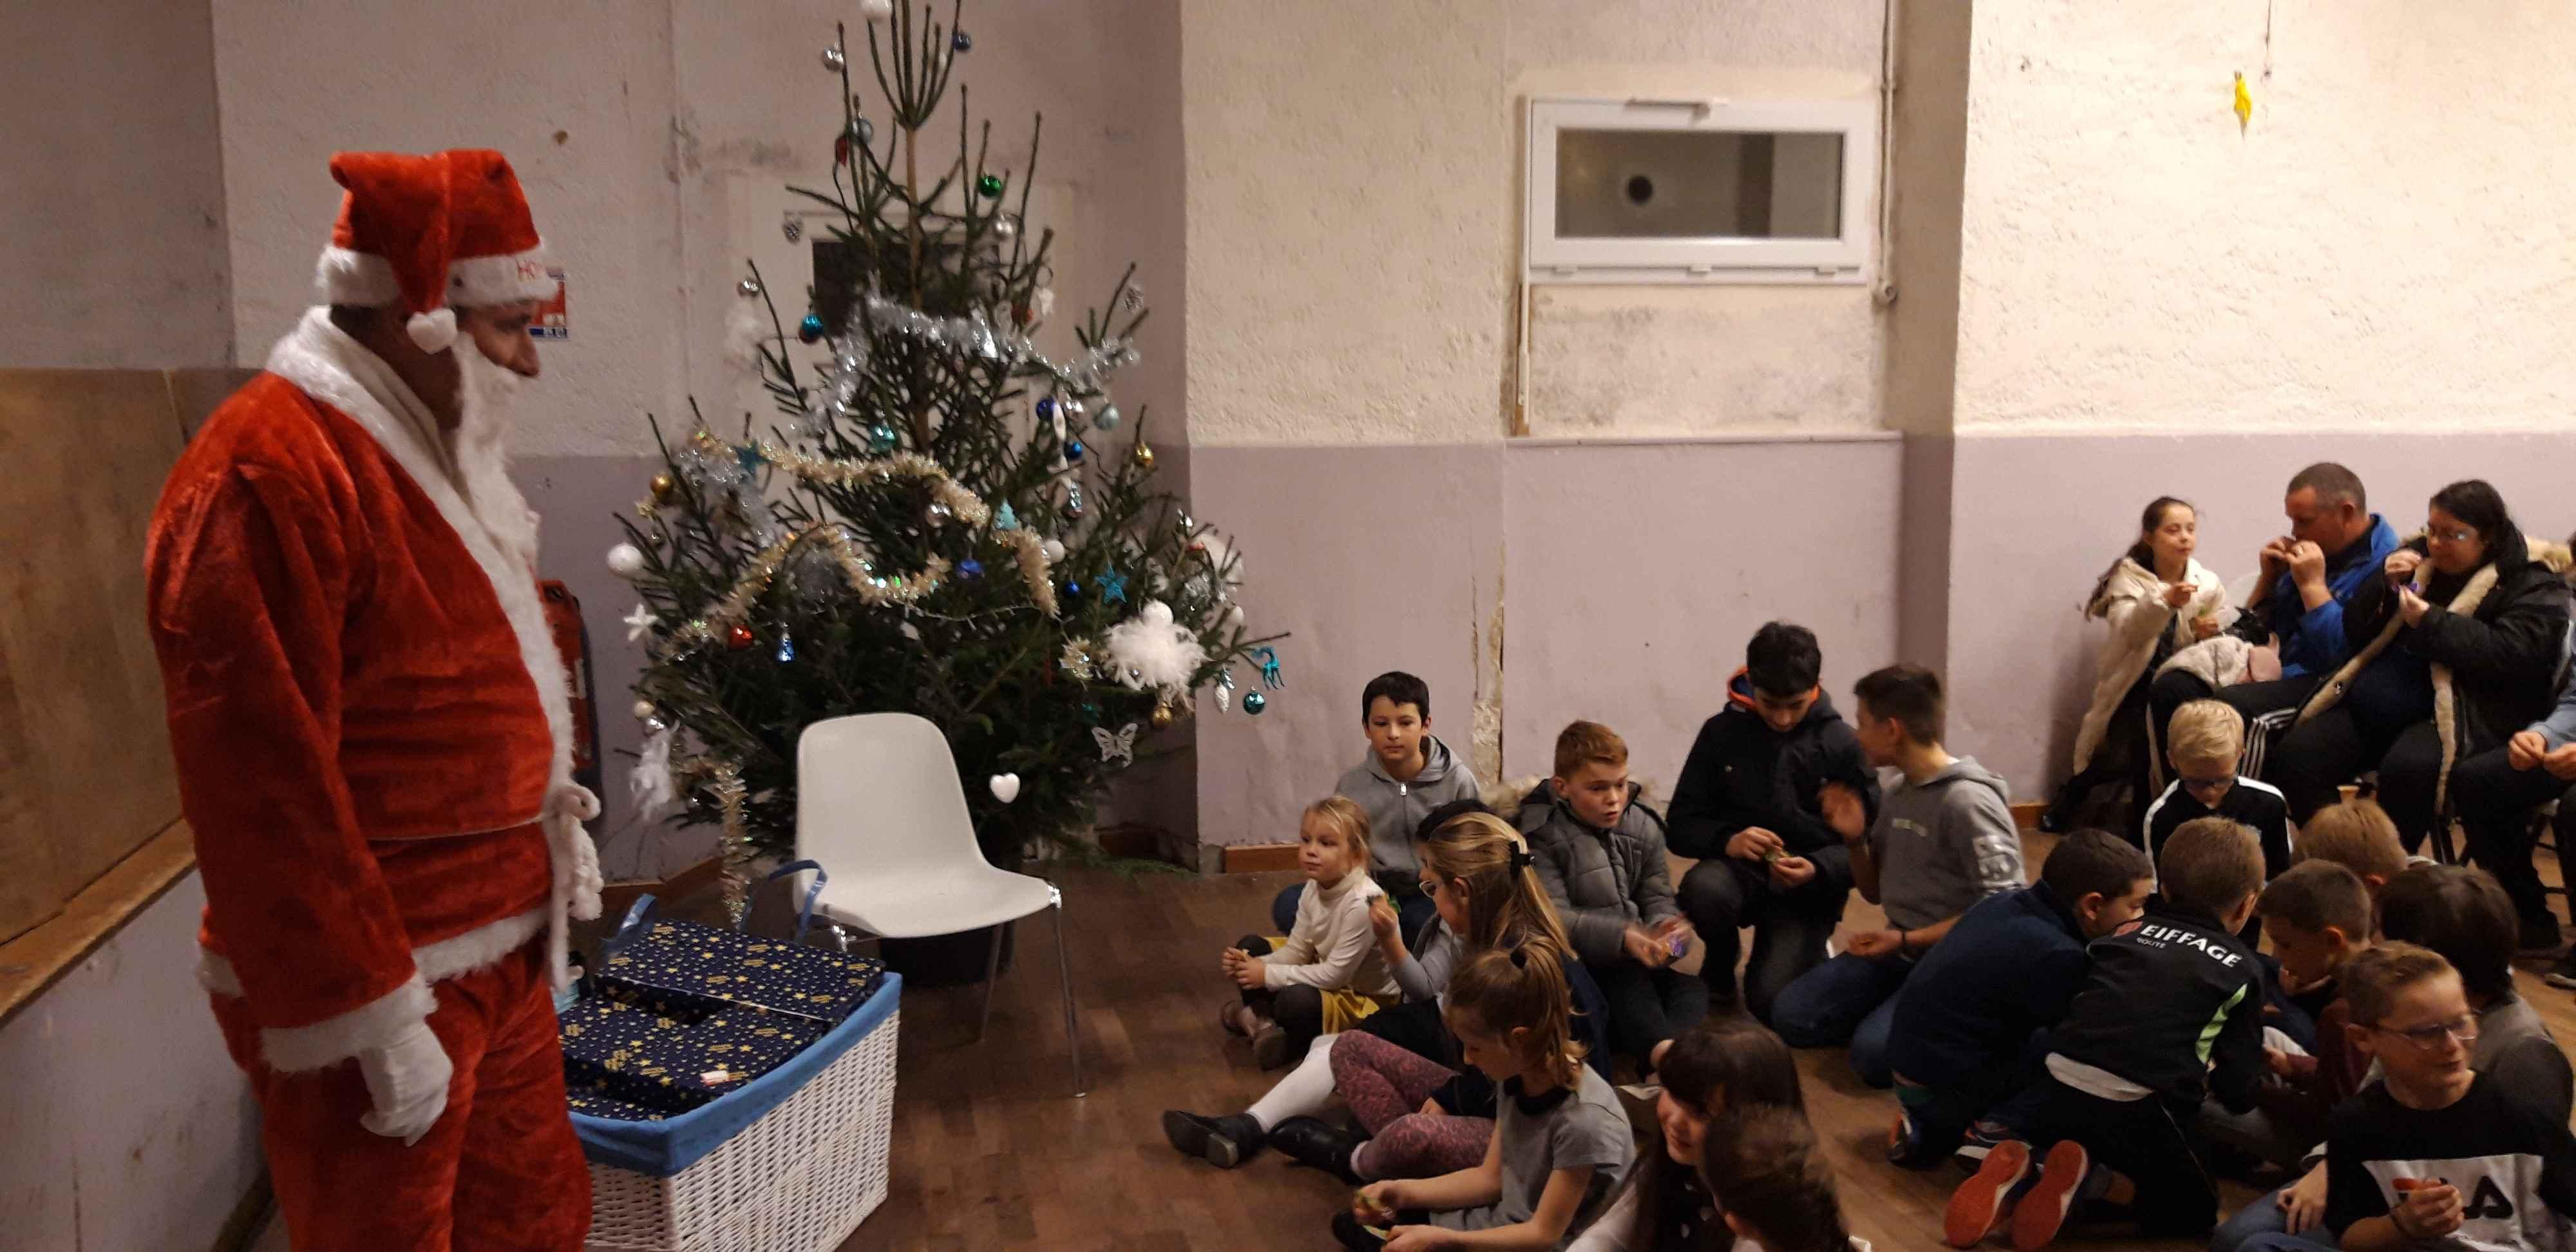 Arbre Noël 2019-12-14 (4)